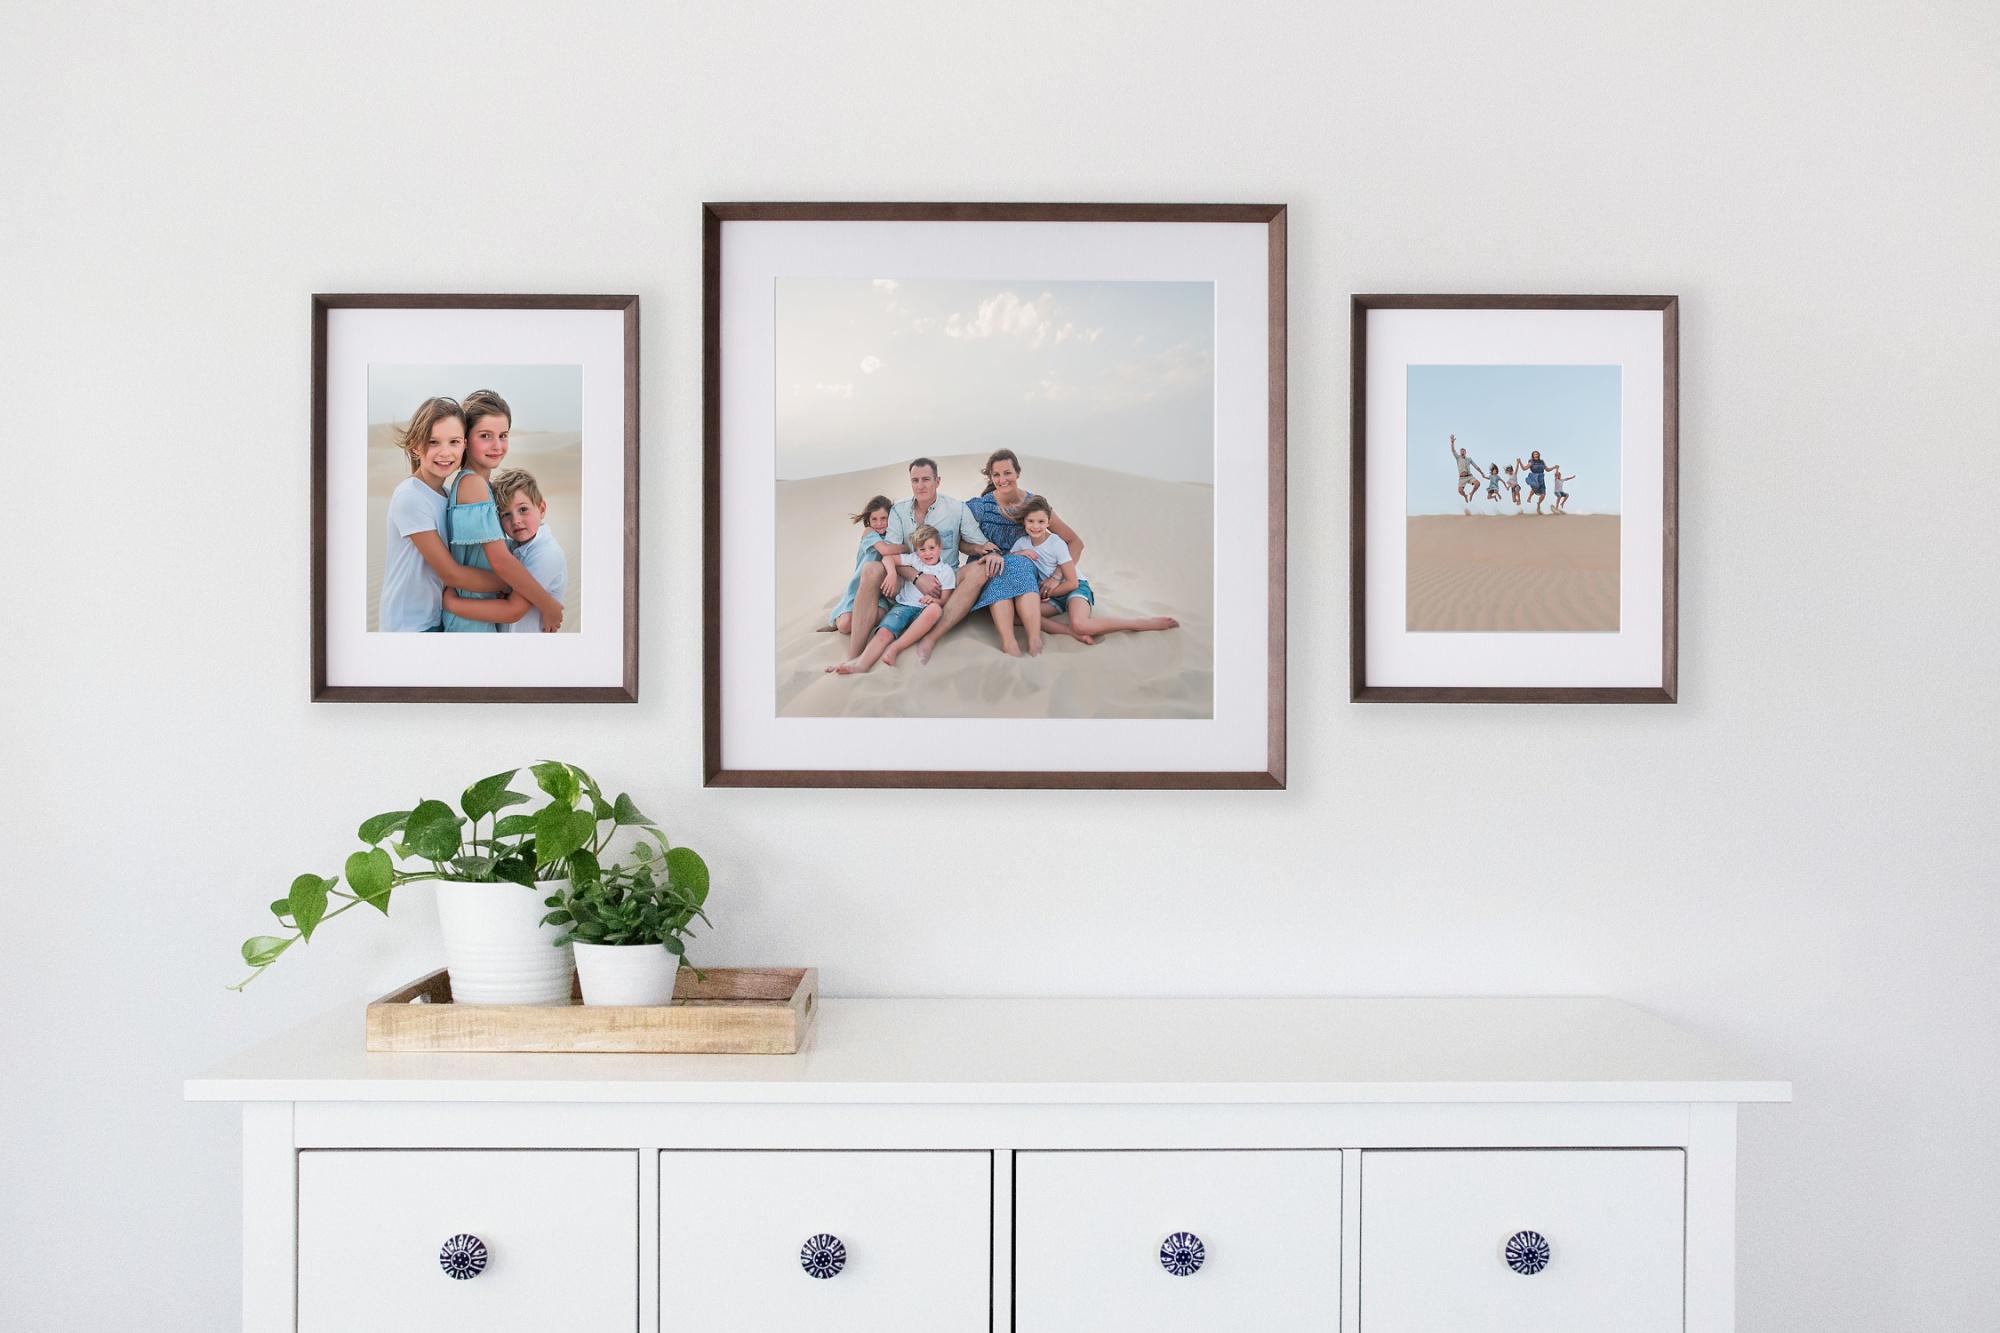 Frames and Wall art ideas_0107.jpg